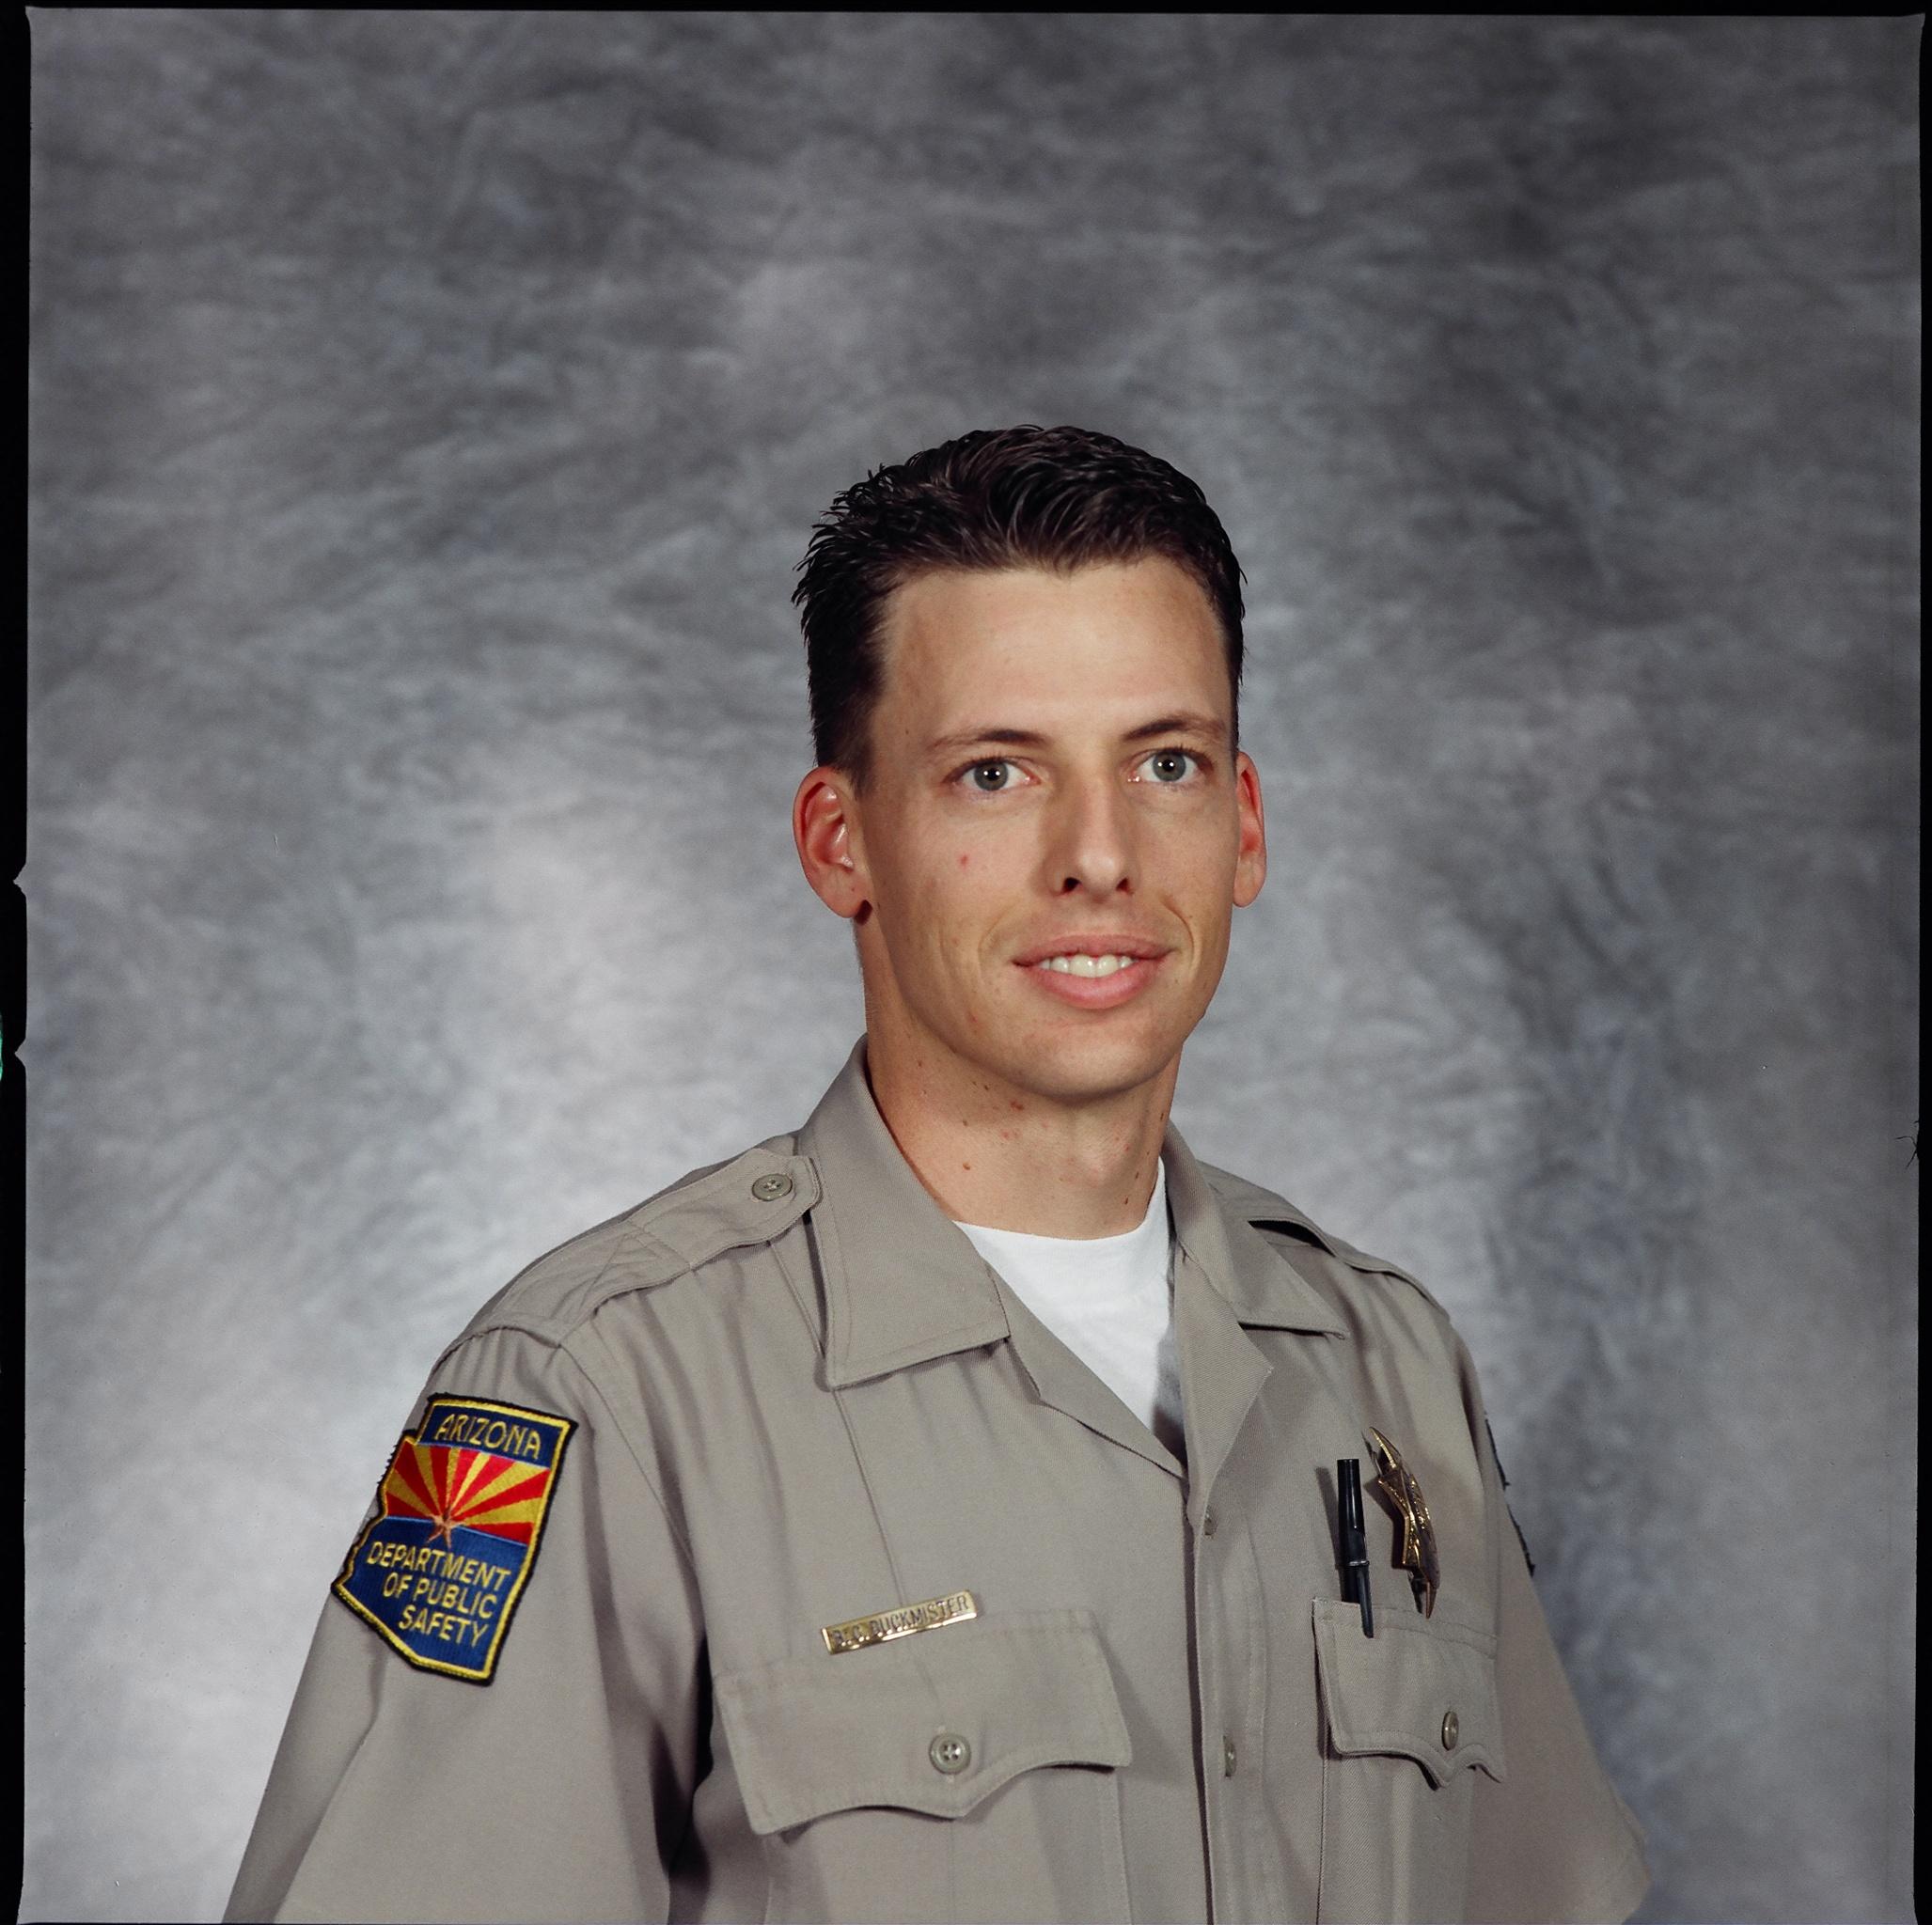 Brett C. Buckmister